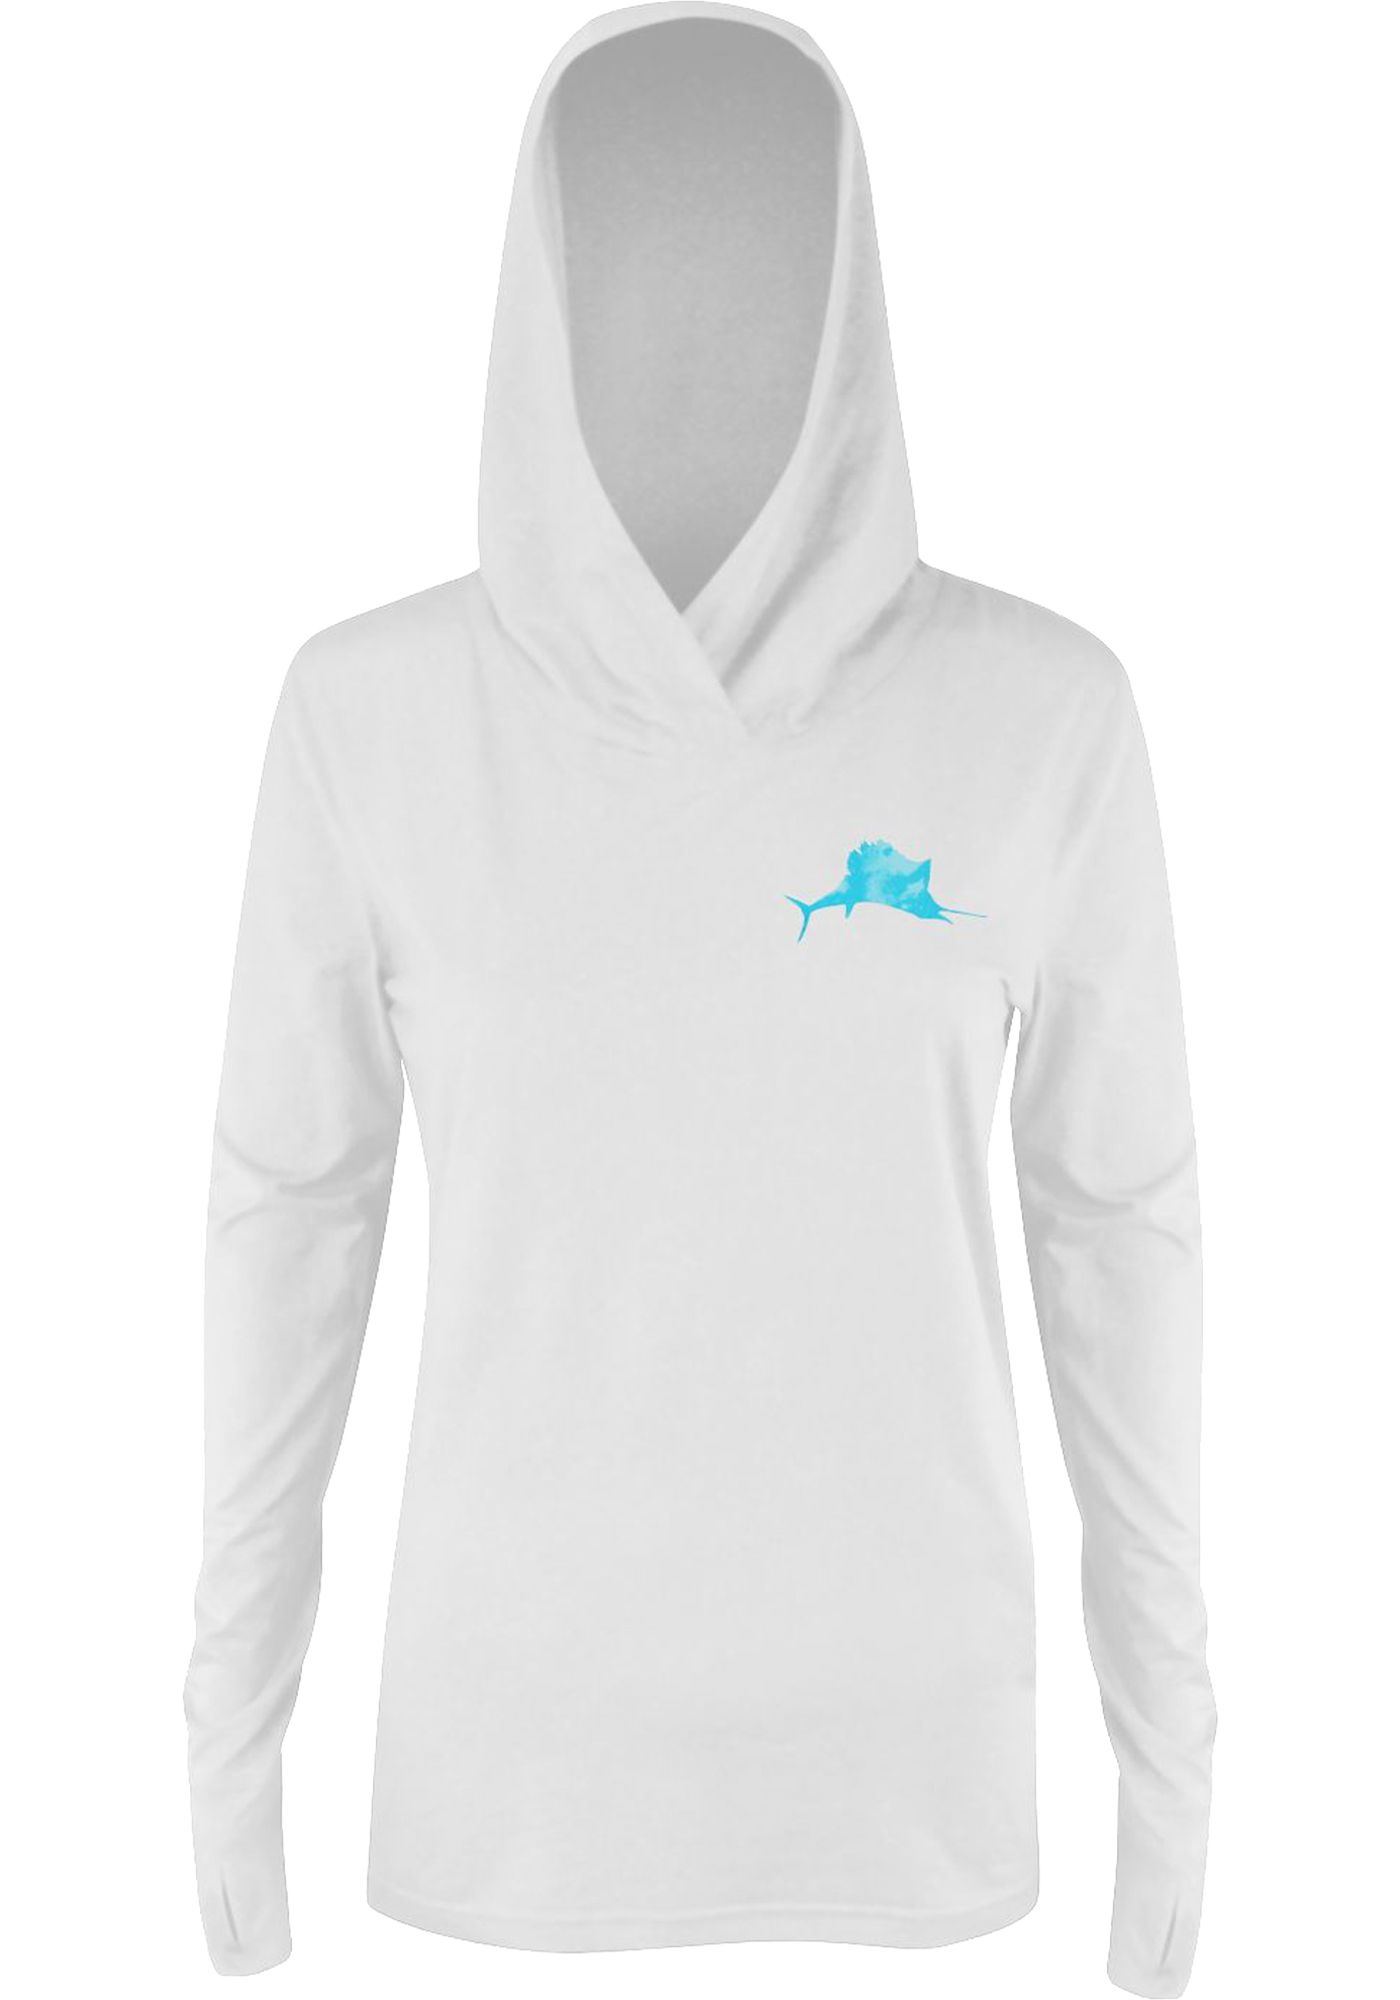 Pelagic Women's UltraTek Long Sleeve Hooded Sunshirt